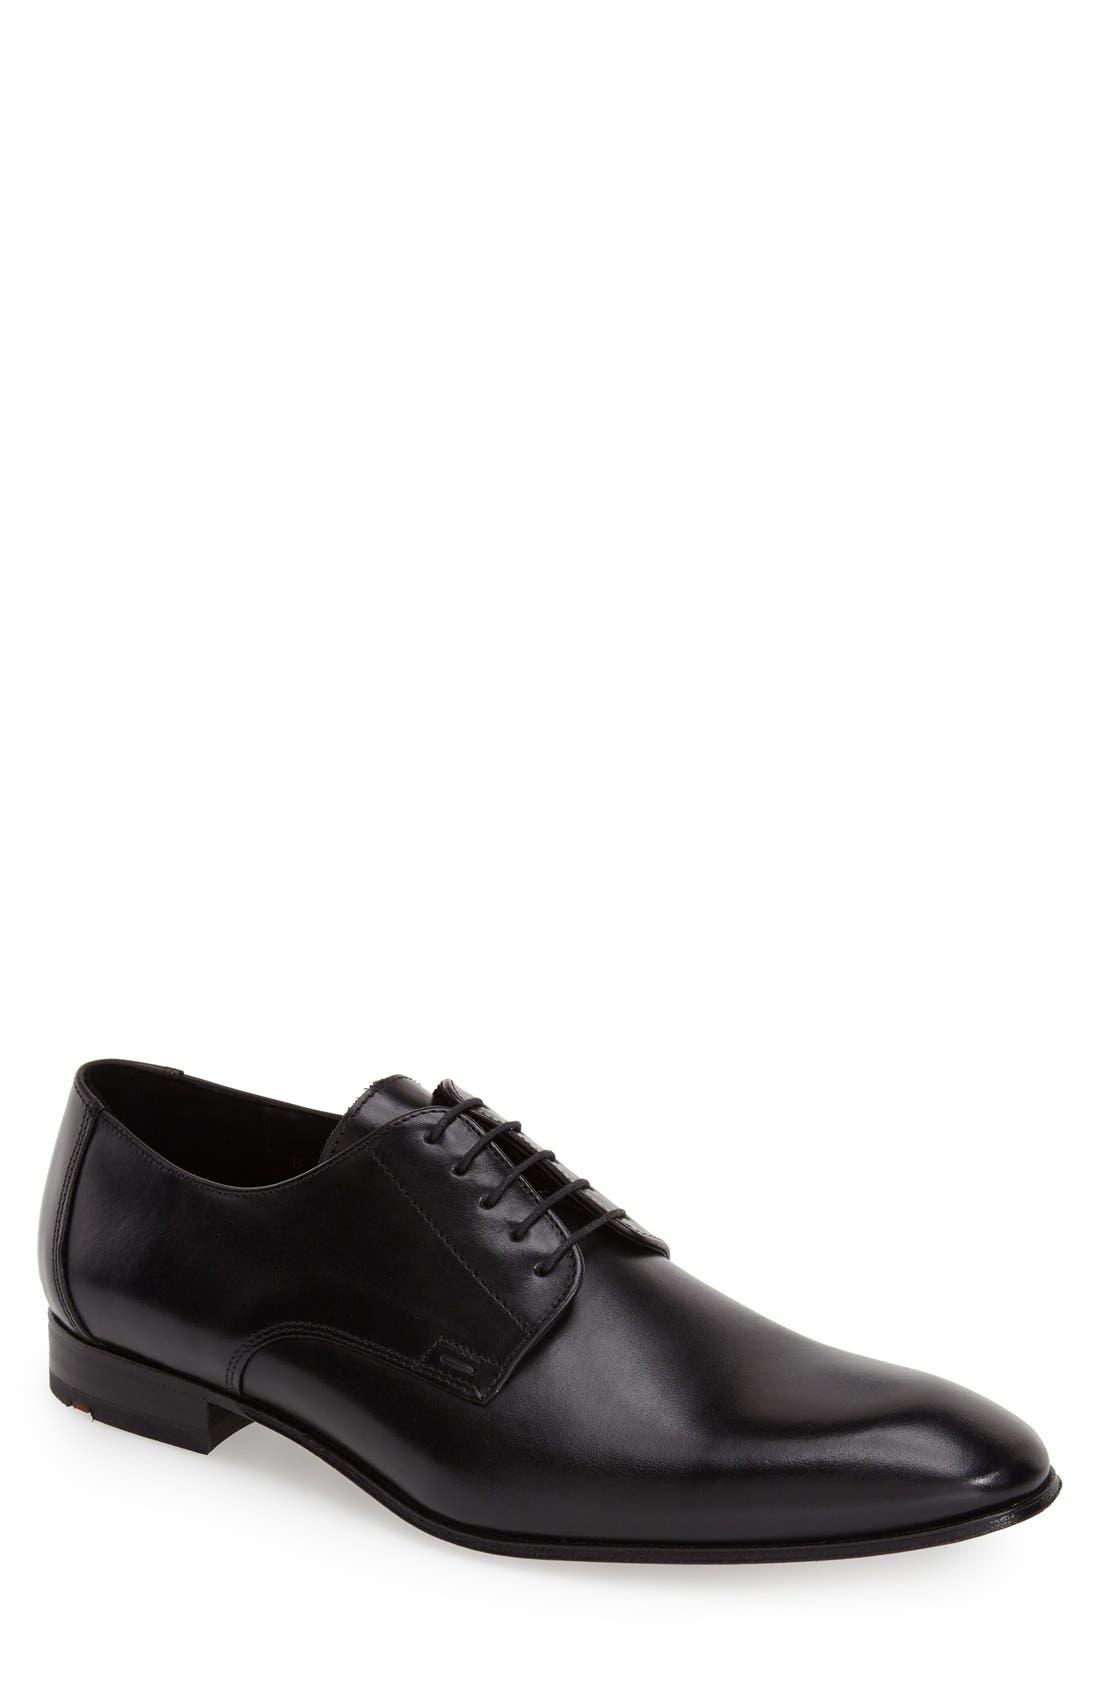 Lloyd Men's Deno Plain Toe Derby bOT89fX